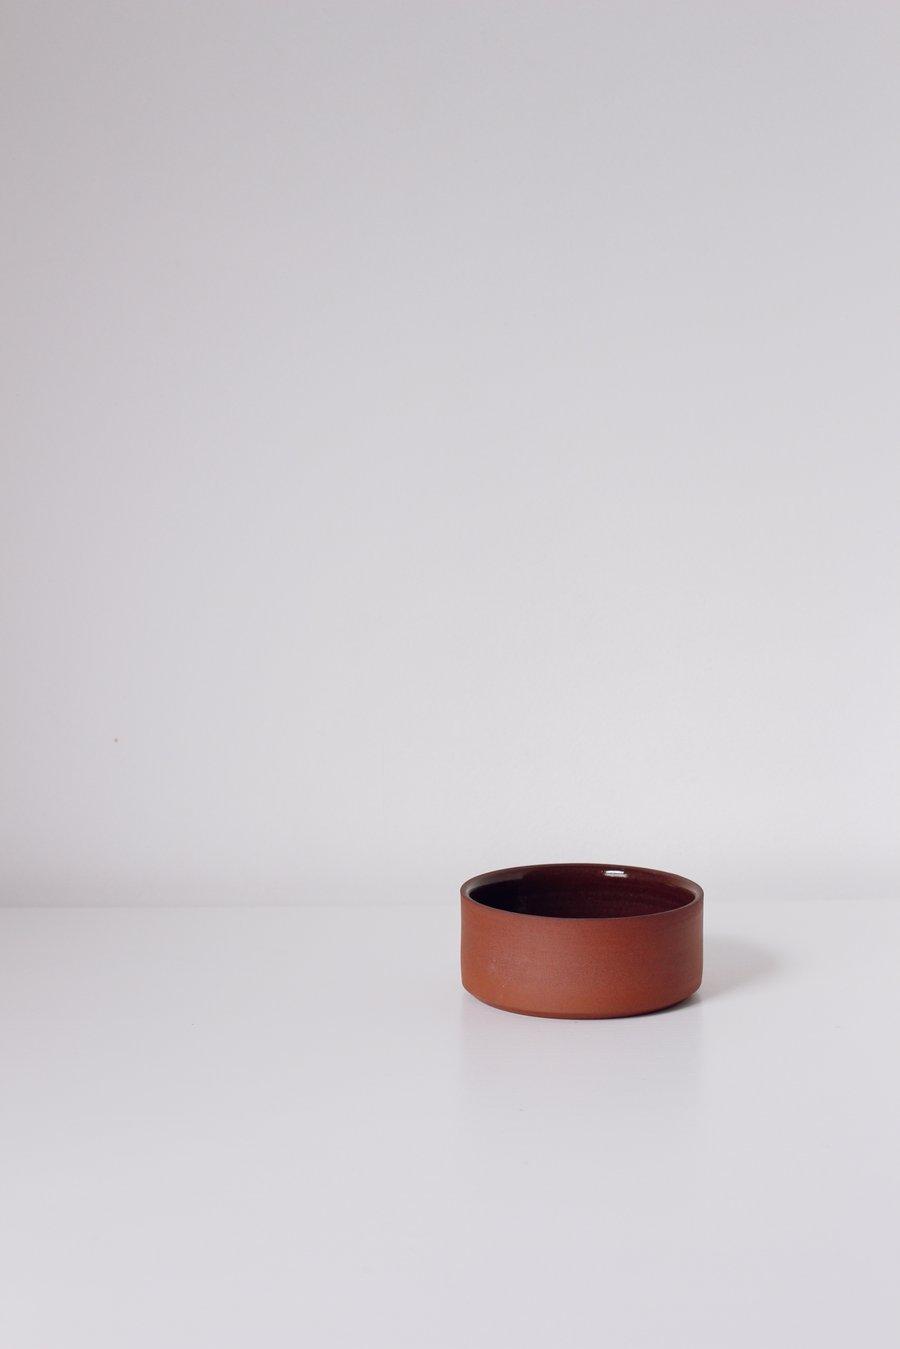 Image of Breakfast Bowl Terracotta